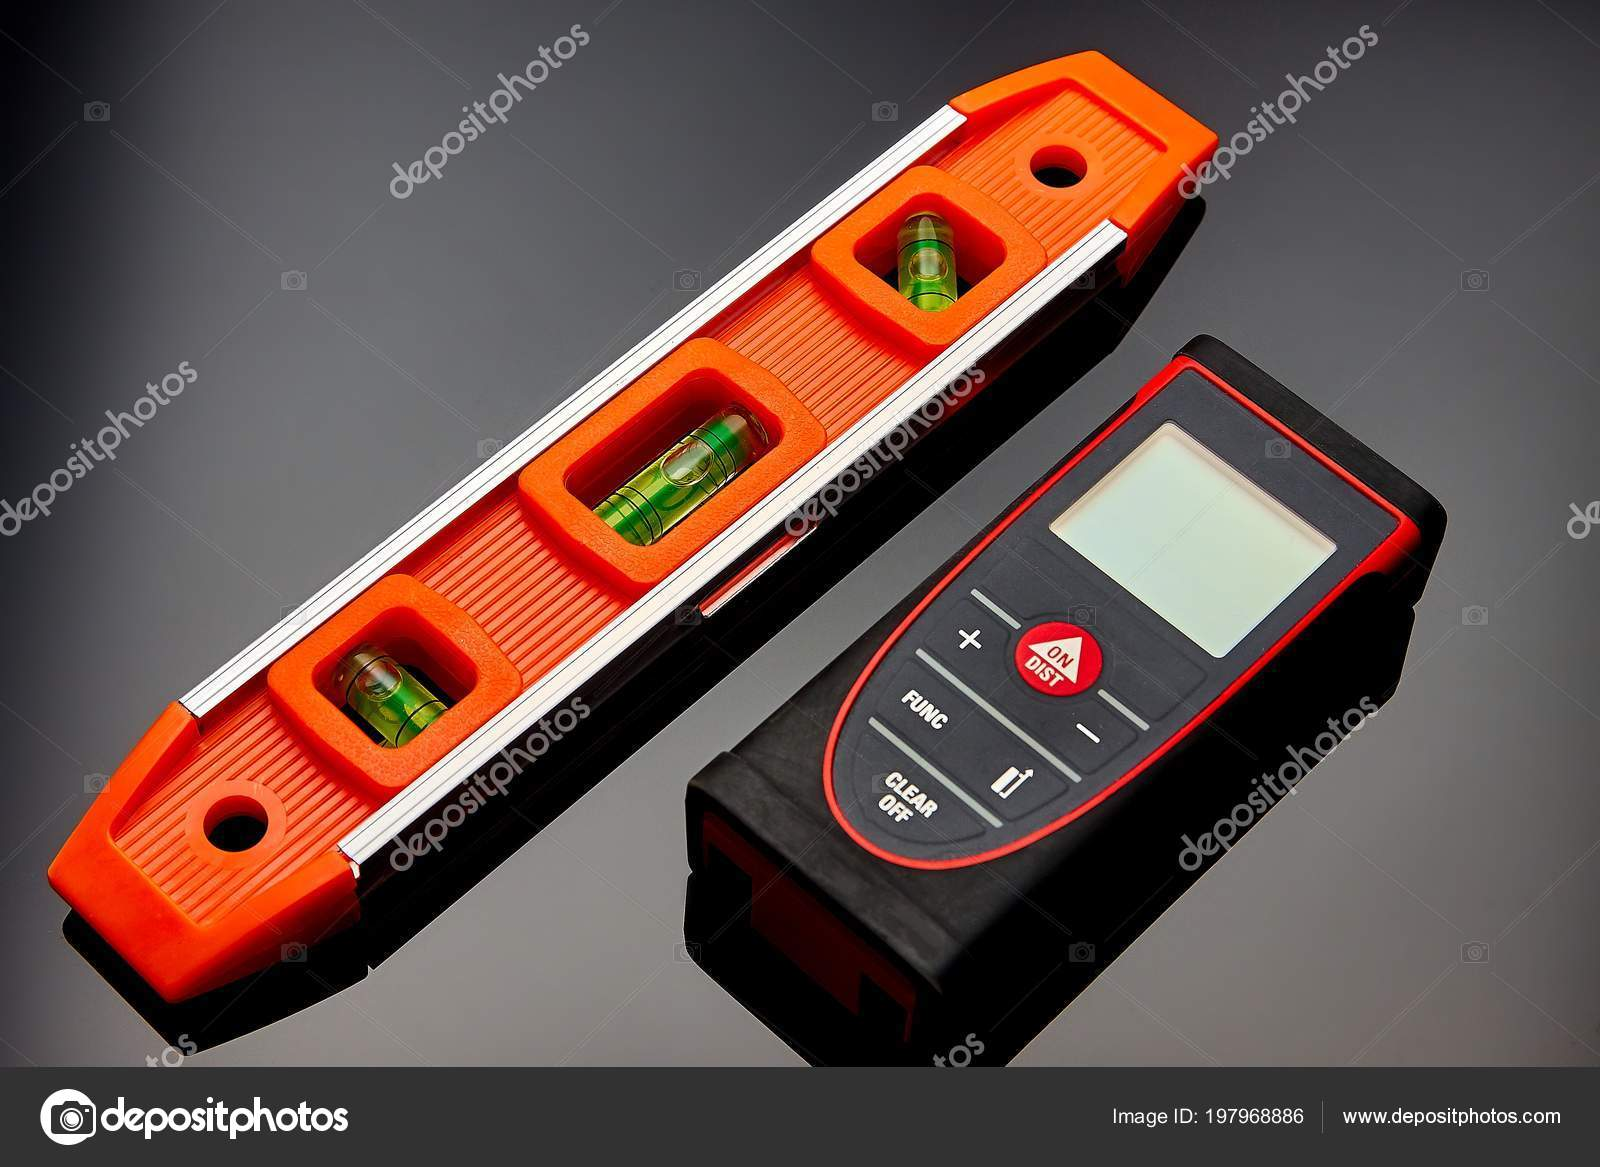 Digitaler Entfernungsmesser Jobs : Bosch professional glm c laser entfernungsmesser meter